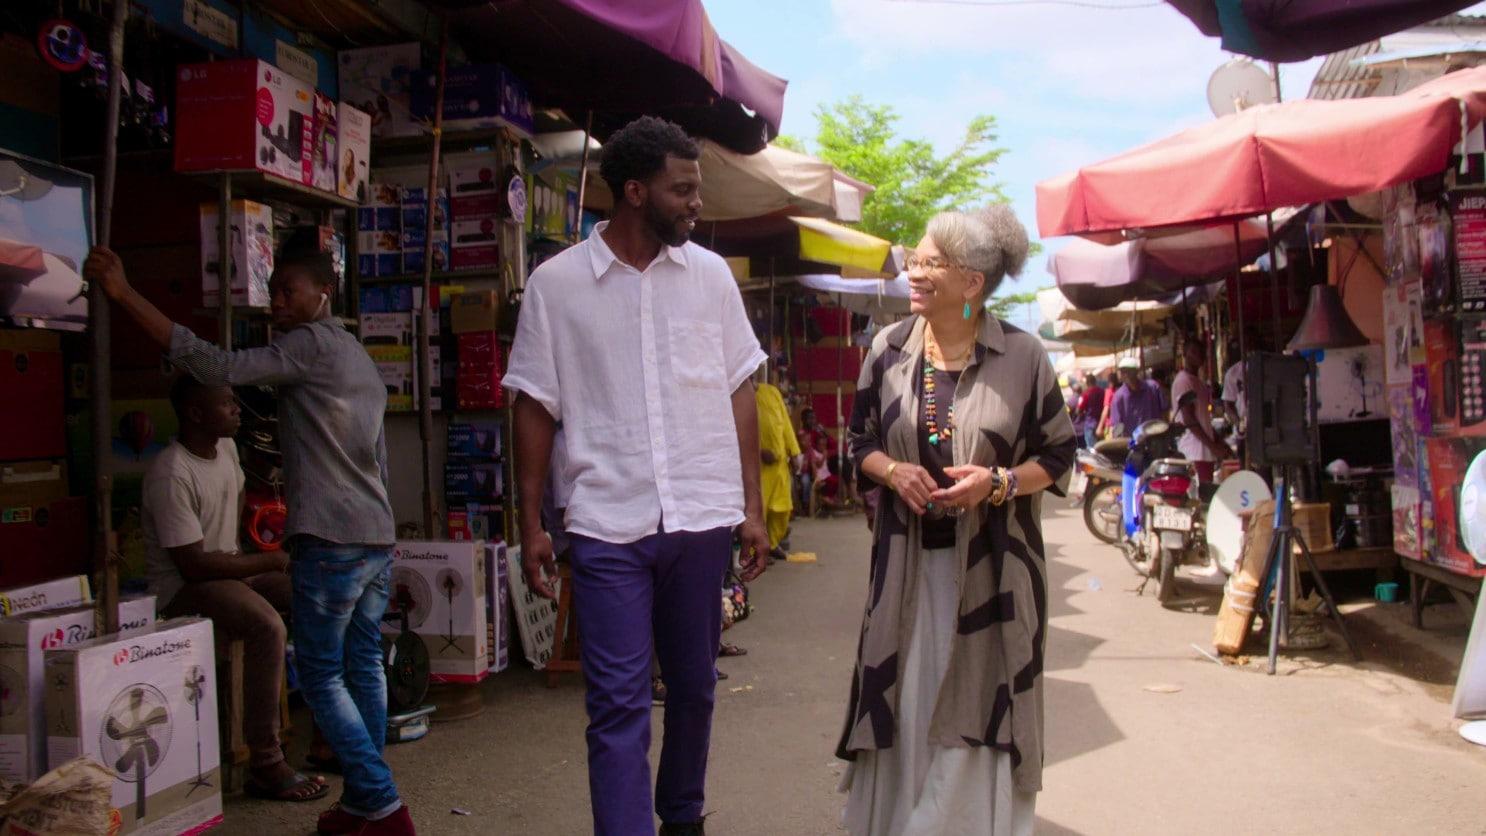 A tall Black man and a Black woman walk through a street market in Benin.